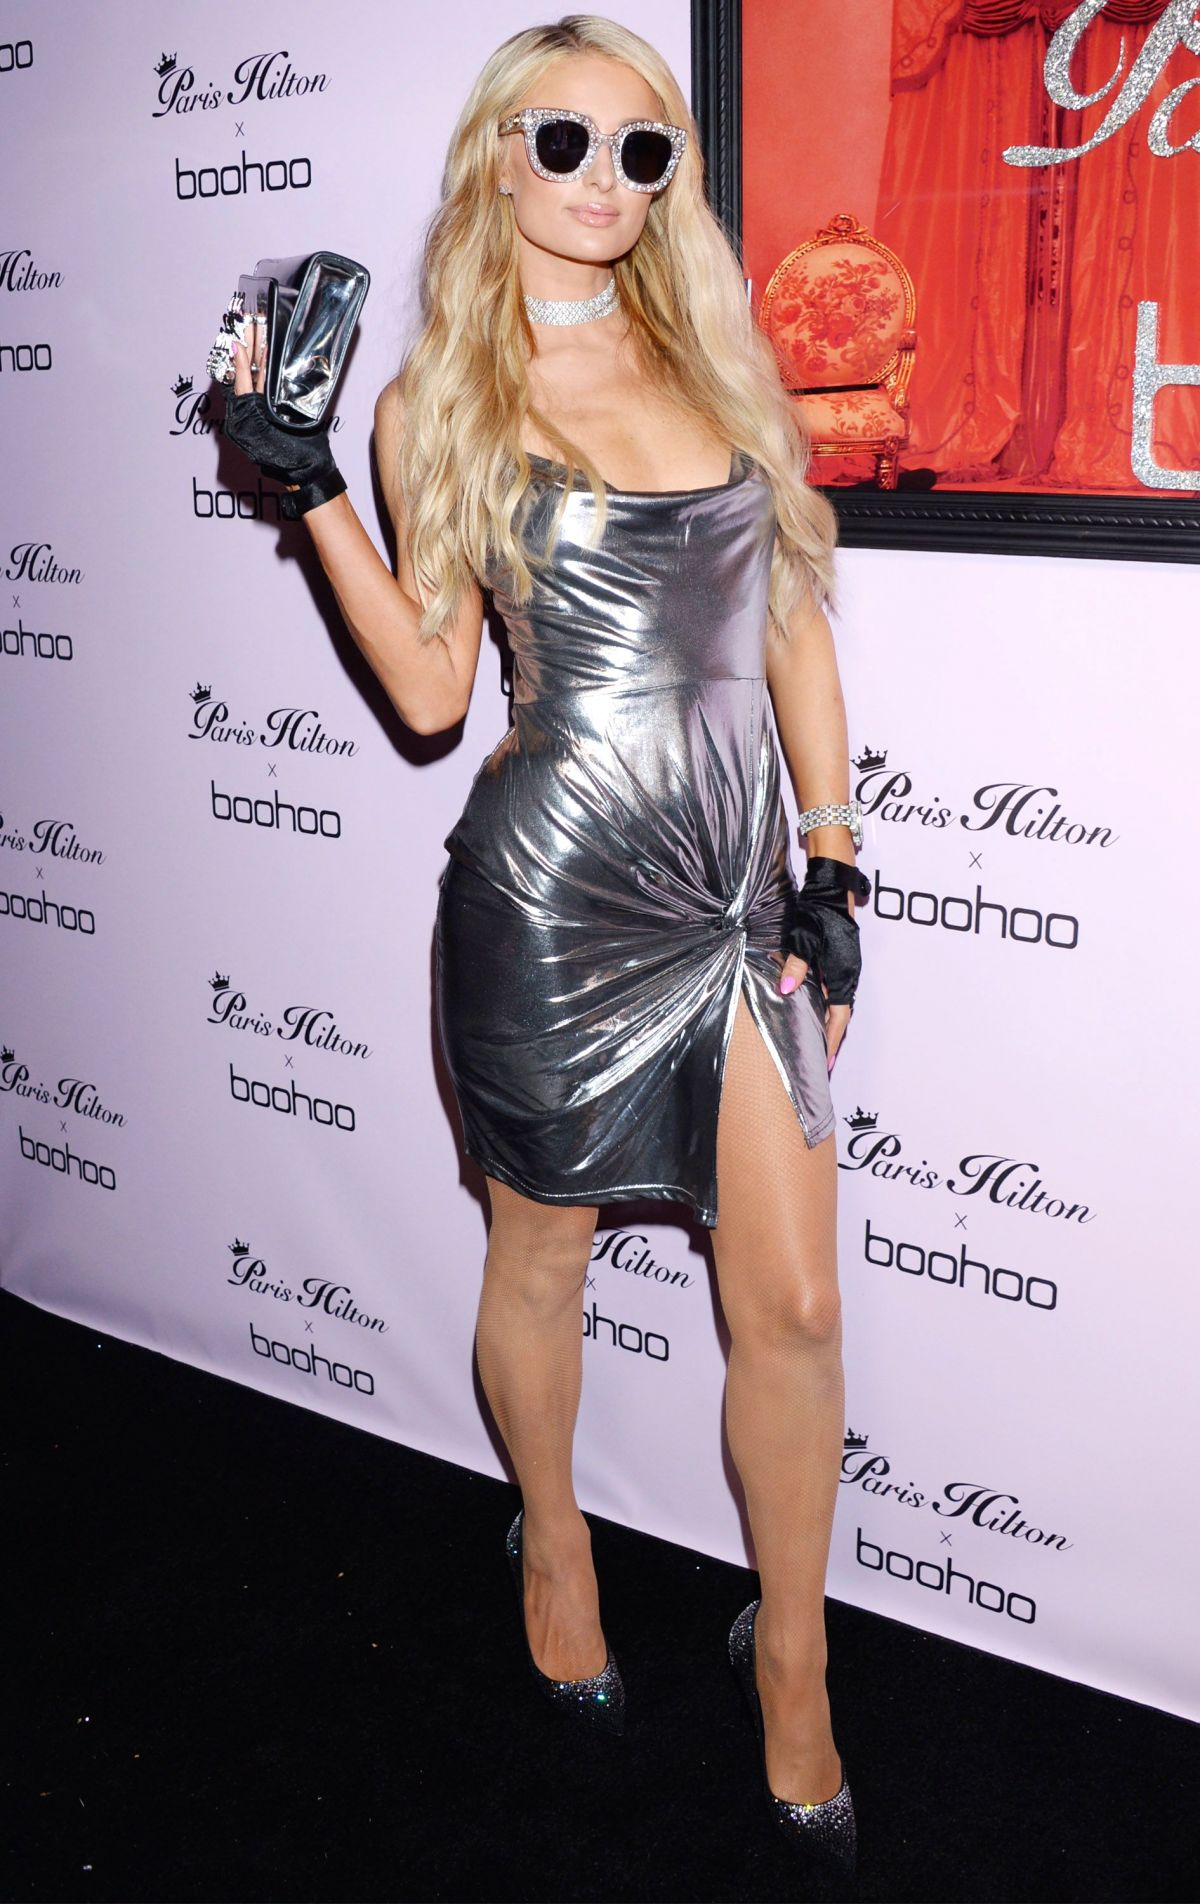 3f6a736277b7 PARIS HILTON at Boohoo x Paris Hilton Launch Party in Los Angeles 06/20/